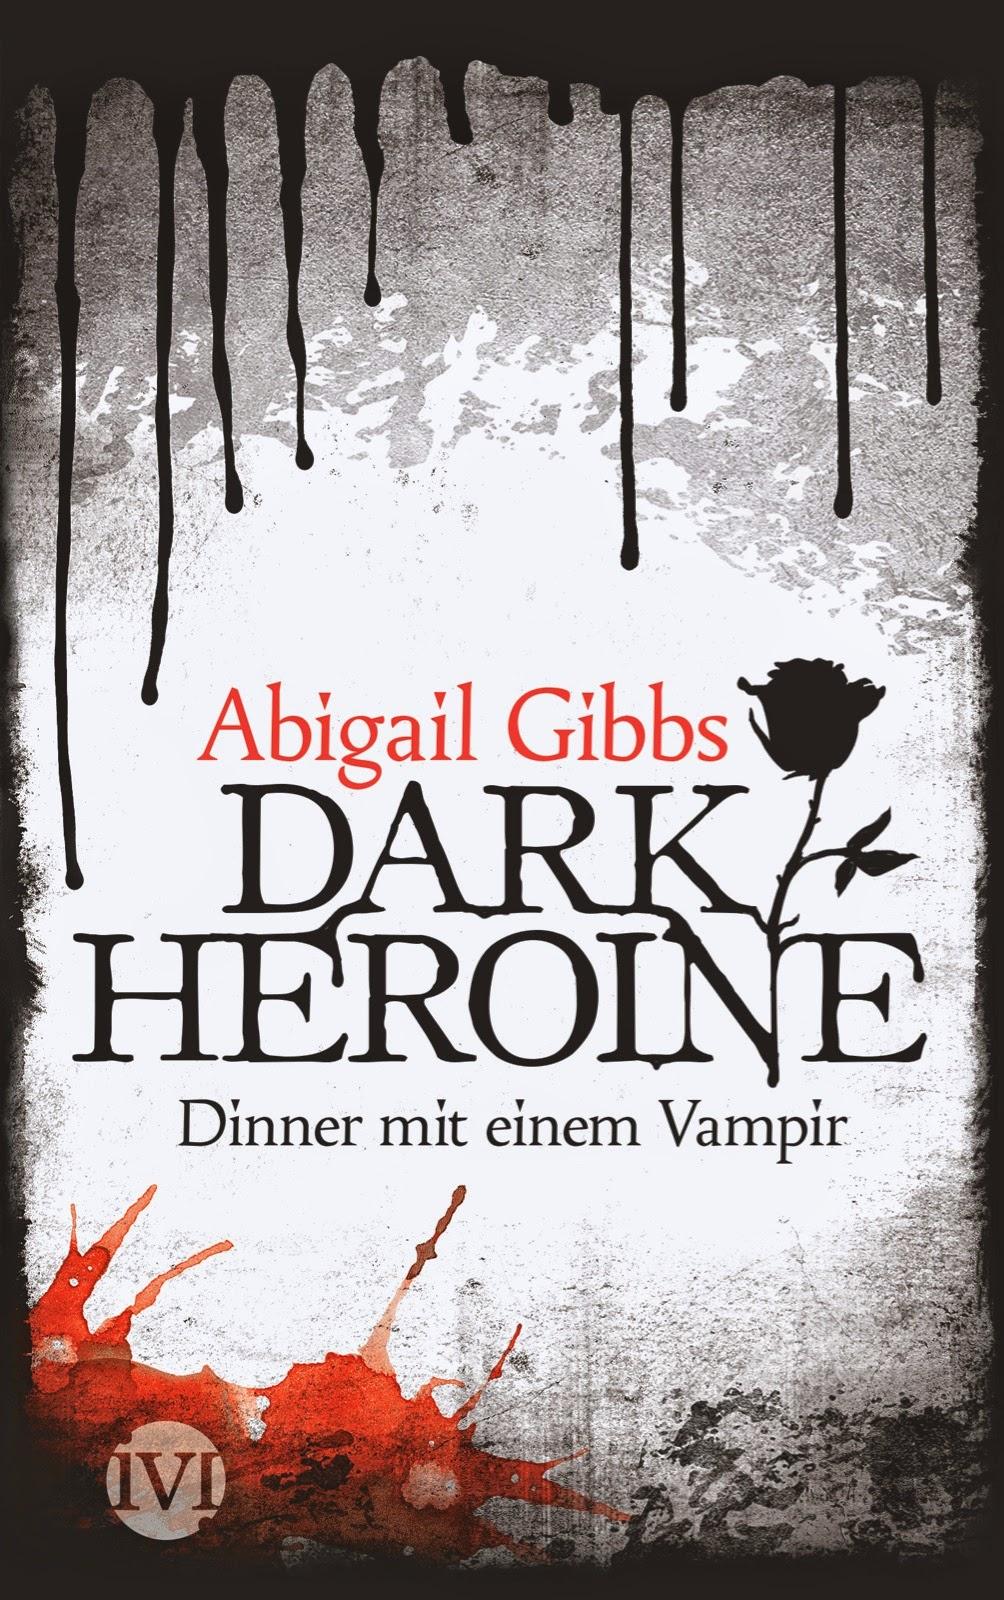 http://www.amazon.de/Dark-Heroine-Dinner-einem-Vampir/dp/349270297X/ref=sr_1_1?ie=UTF8&qid=1398516833&sr=8-1&keywords=dark+heroine+-+dinner+mit+einem+vampir